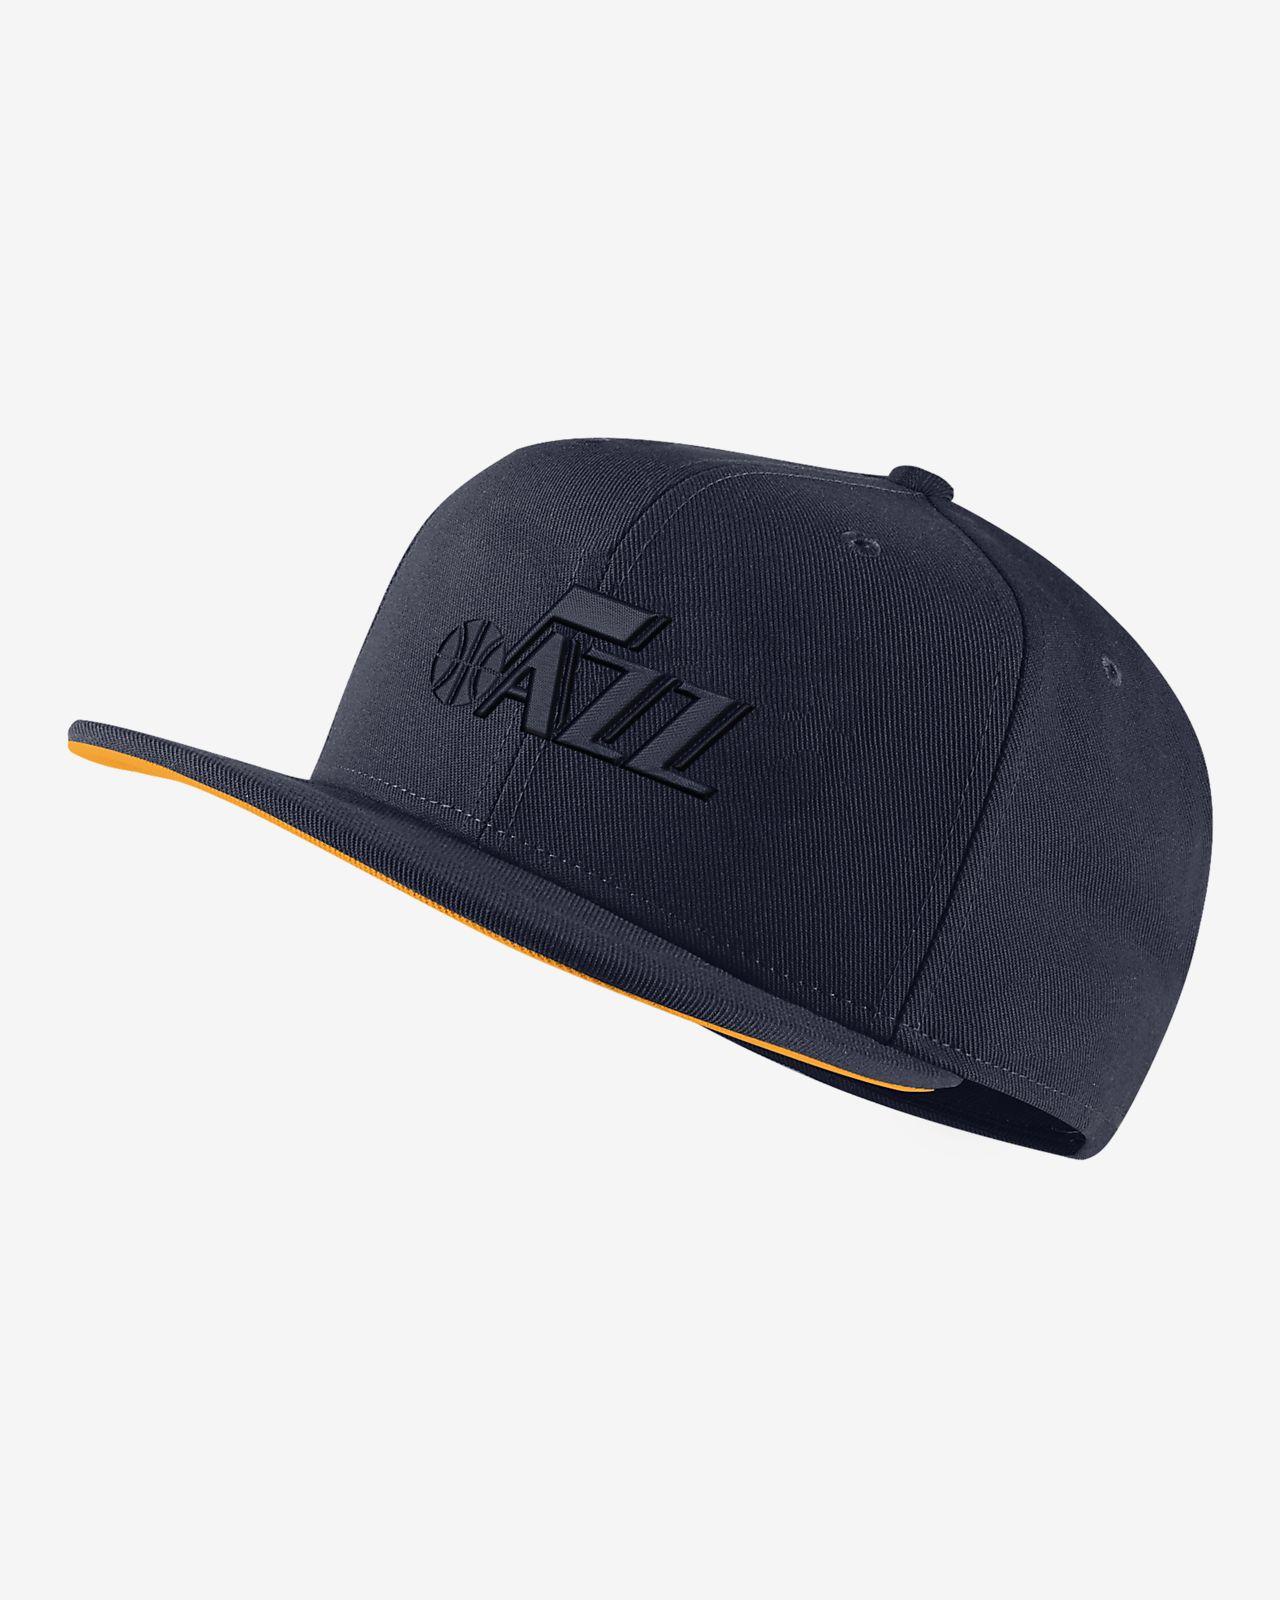 Utah Jazz Nike AeroBill Gorra de l'NBA